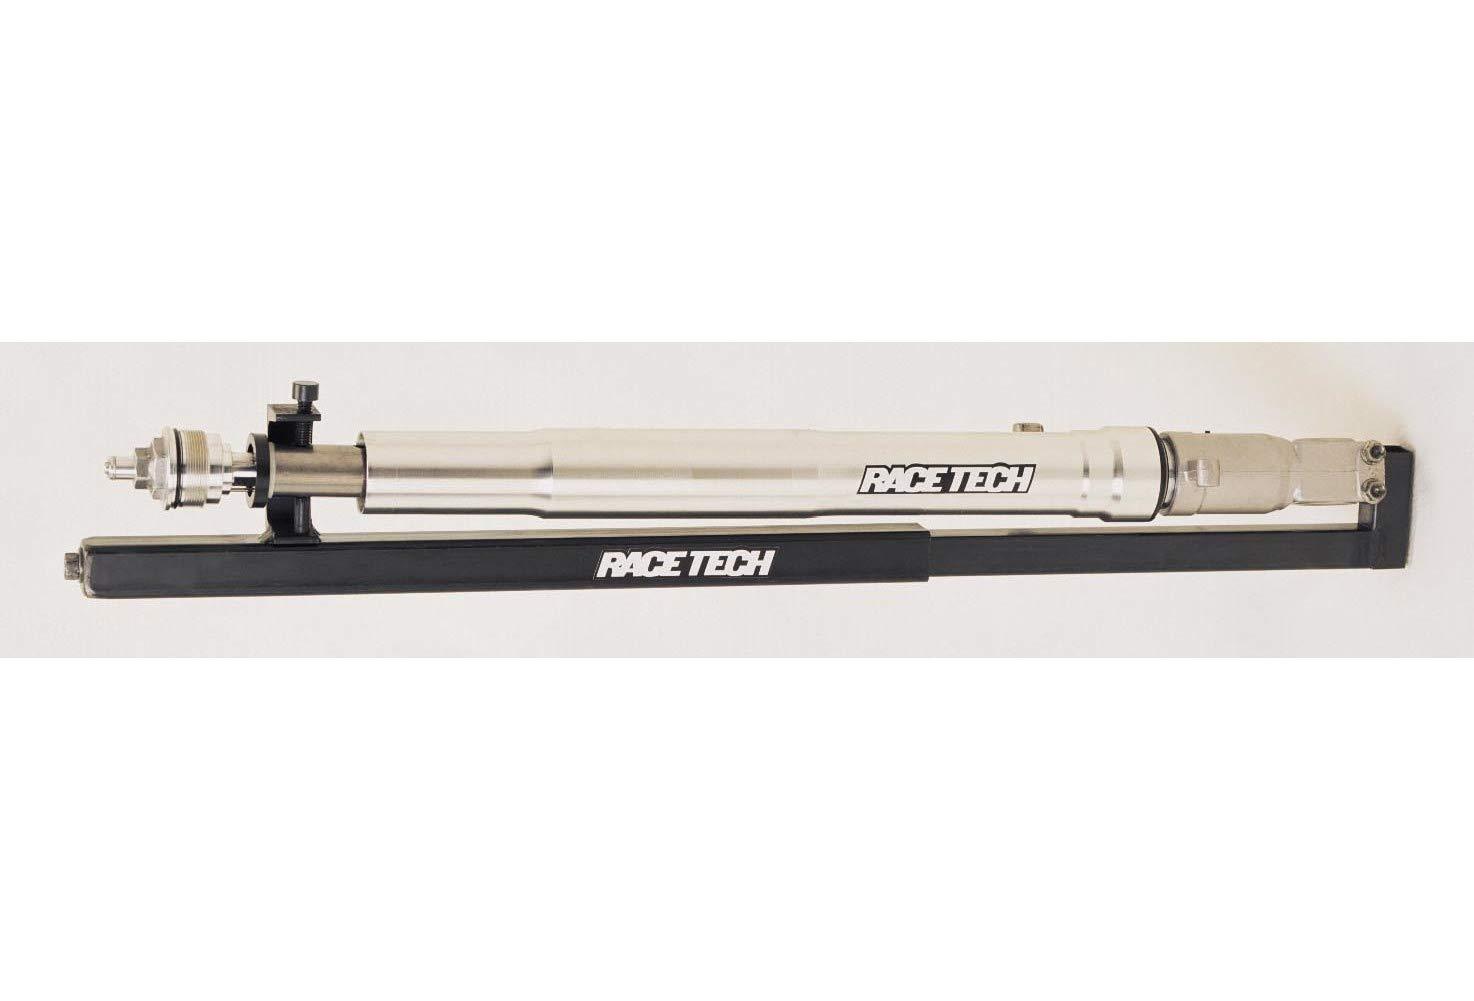 Race Tech Fork Spring Compressor Tool TFSC 01 tr-772640